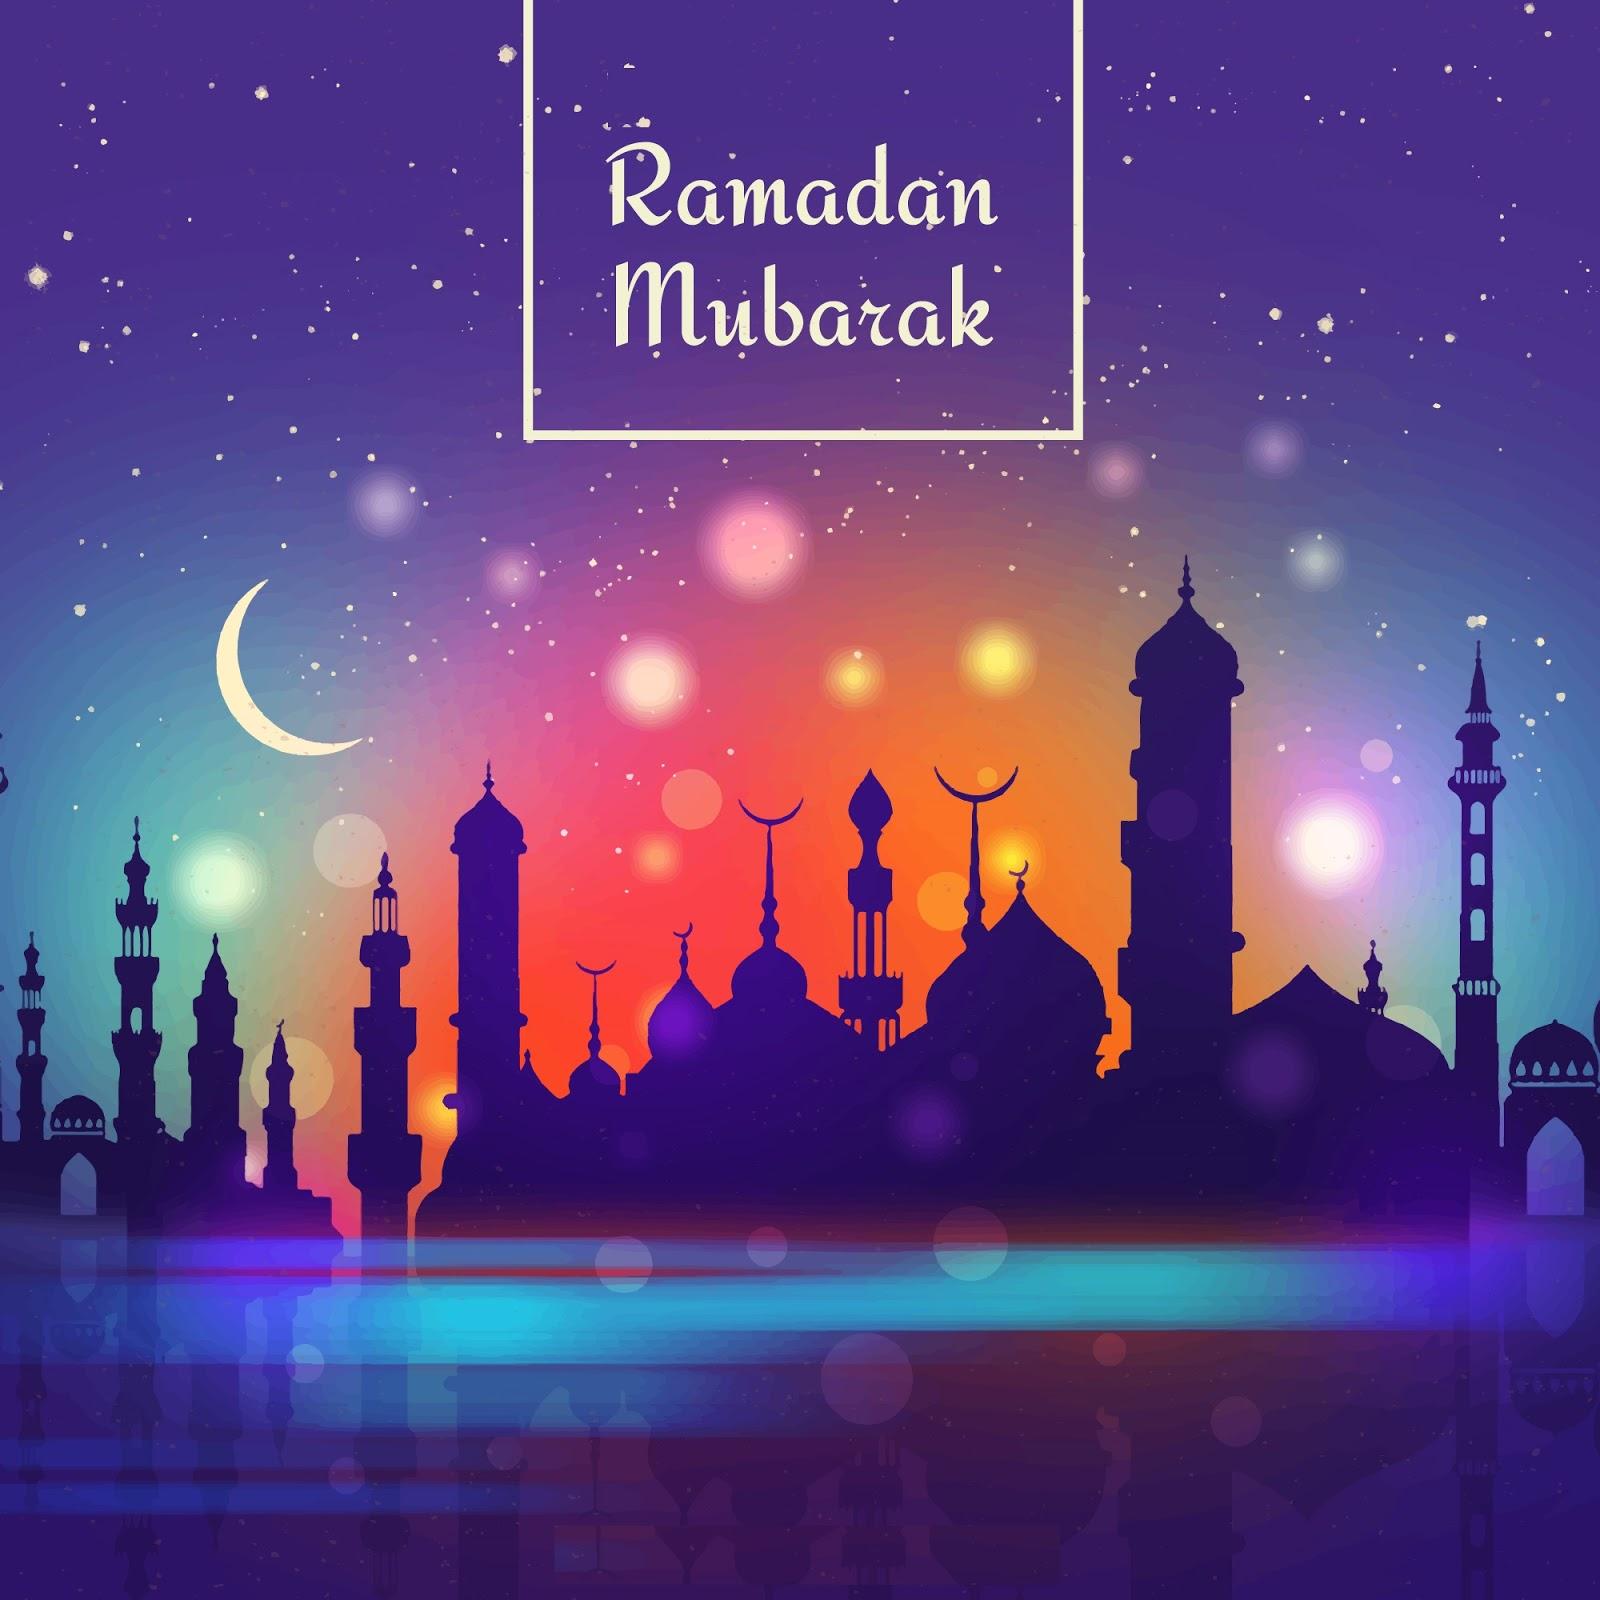 Ramadan-Kareem-Images-2019